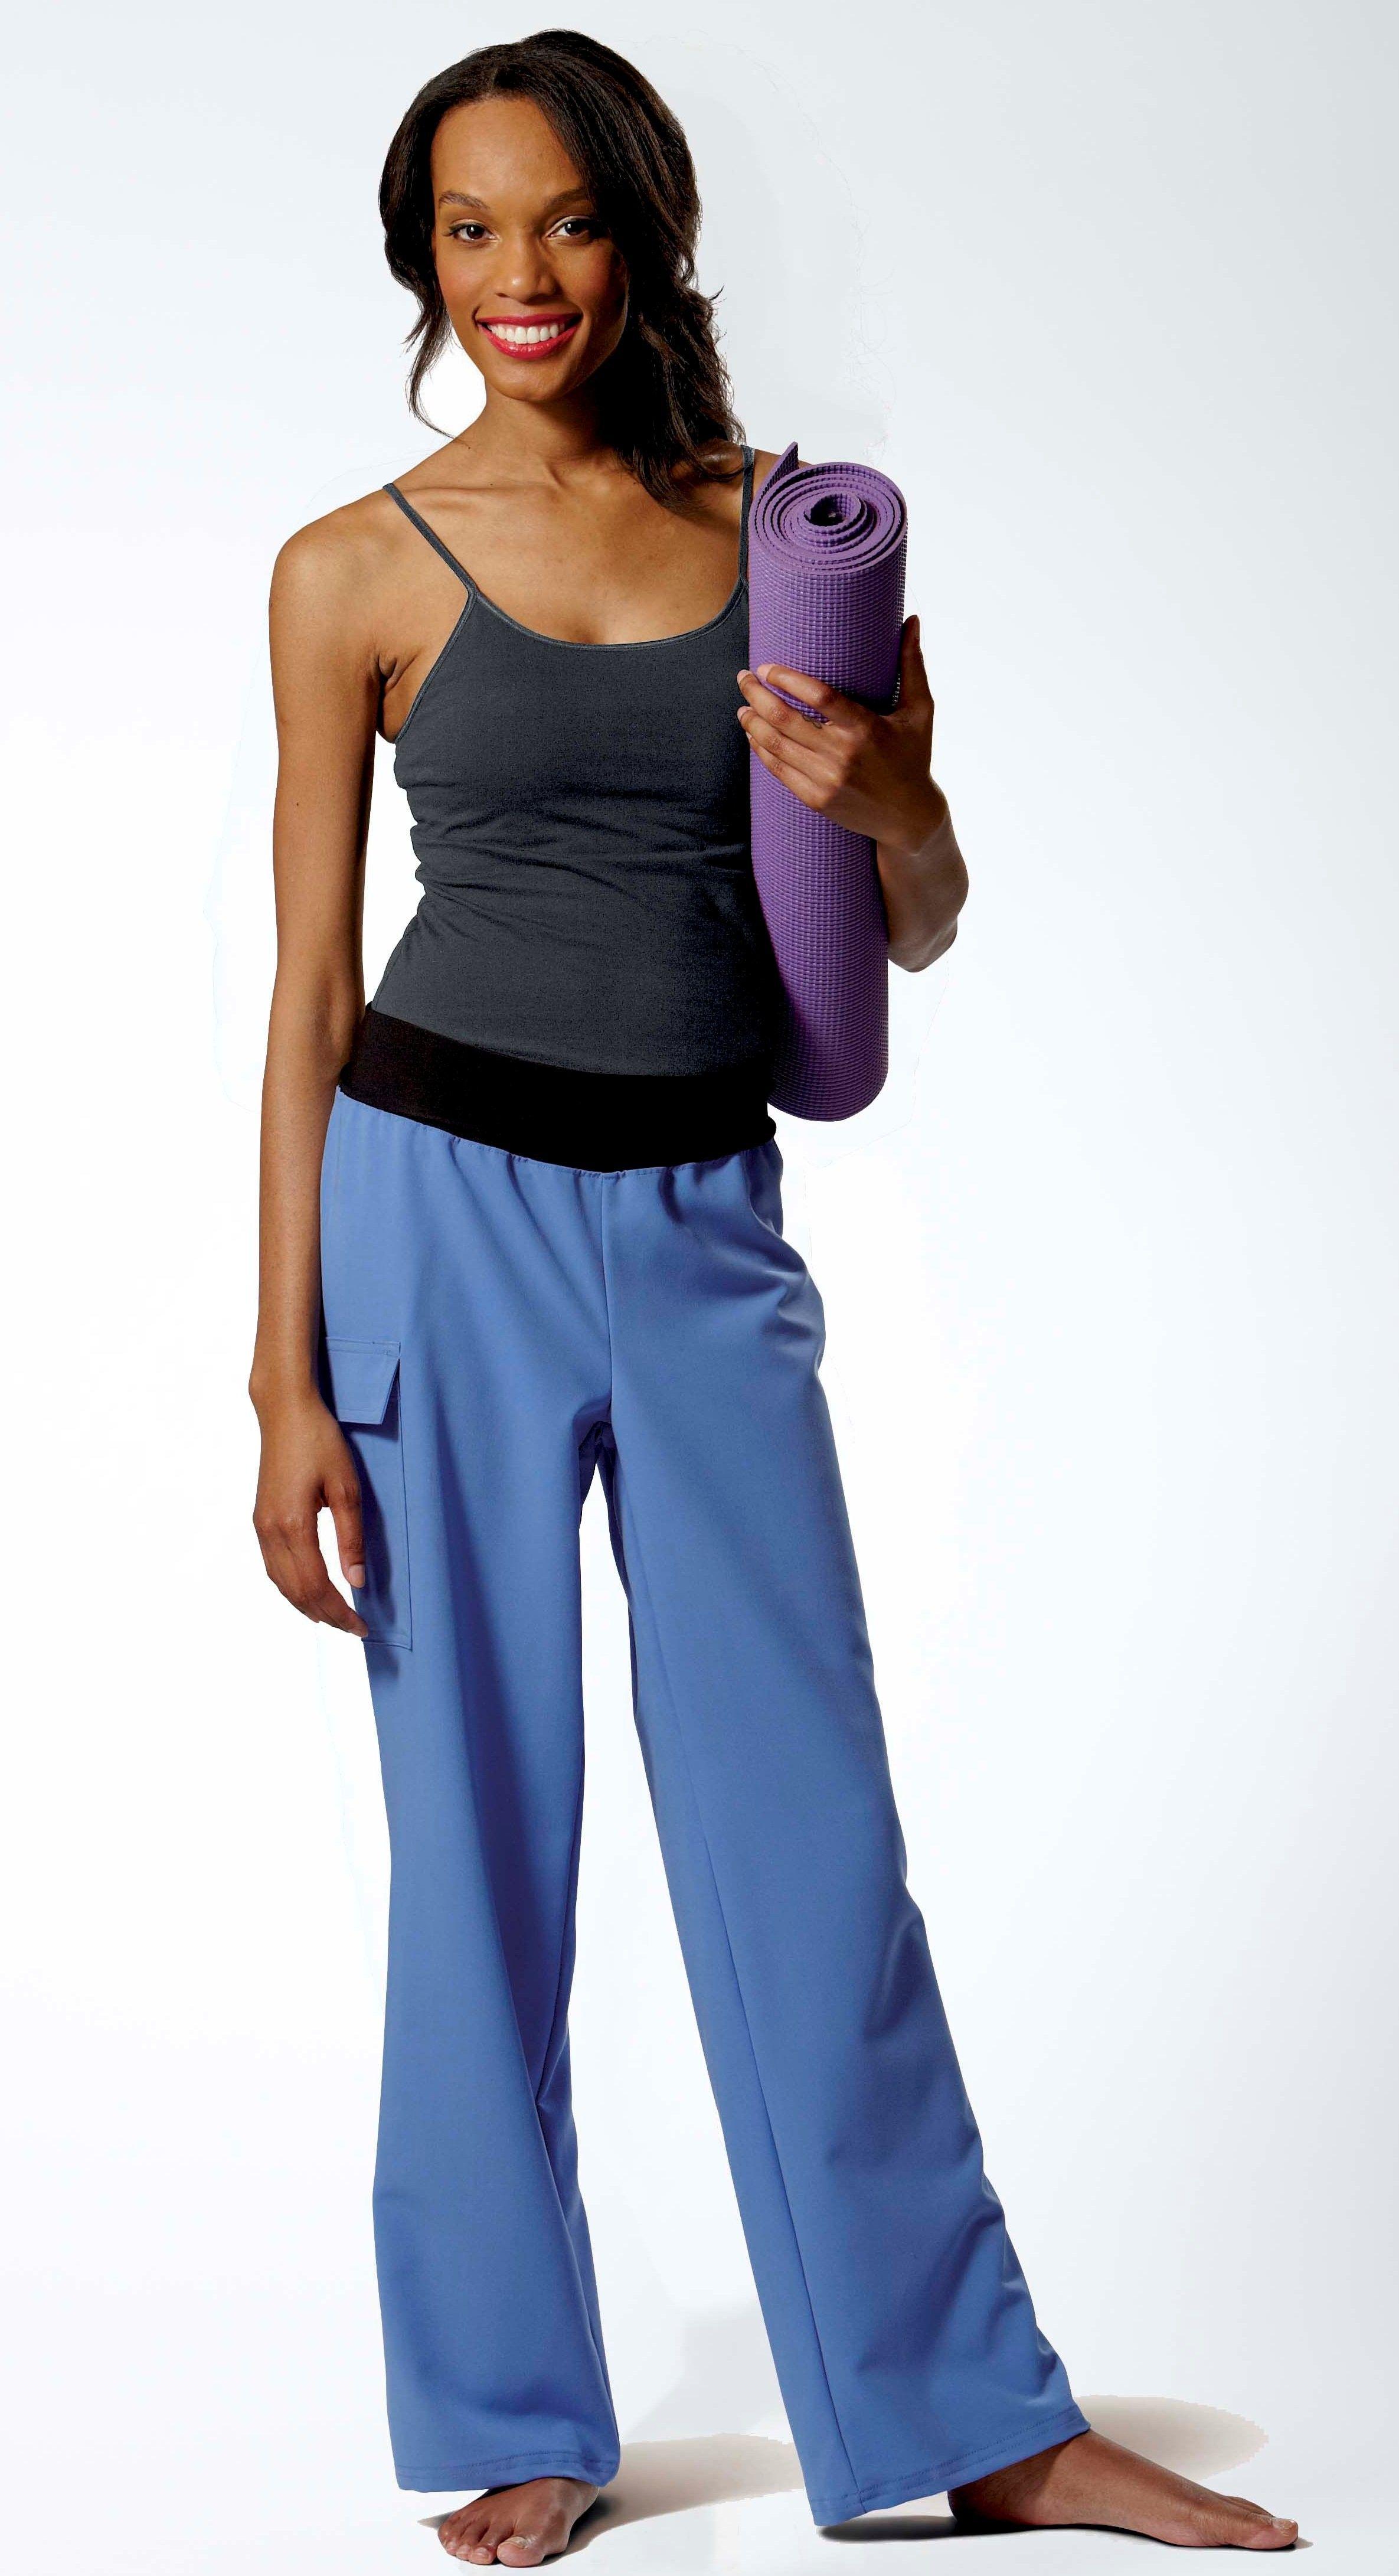 AVE. | Scrub Pant | Ocean AVE. Womenu0026#39;s Yoga Pants - $22.99 | AVE. by Medline Fashion Scrubs ...